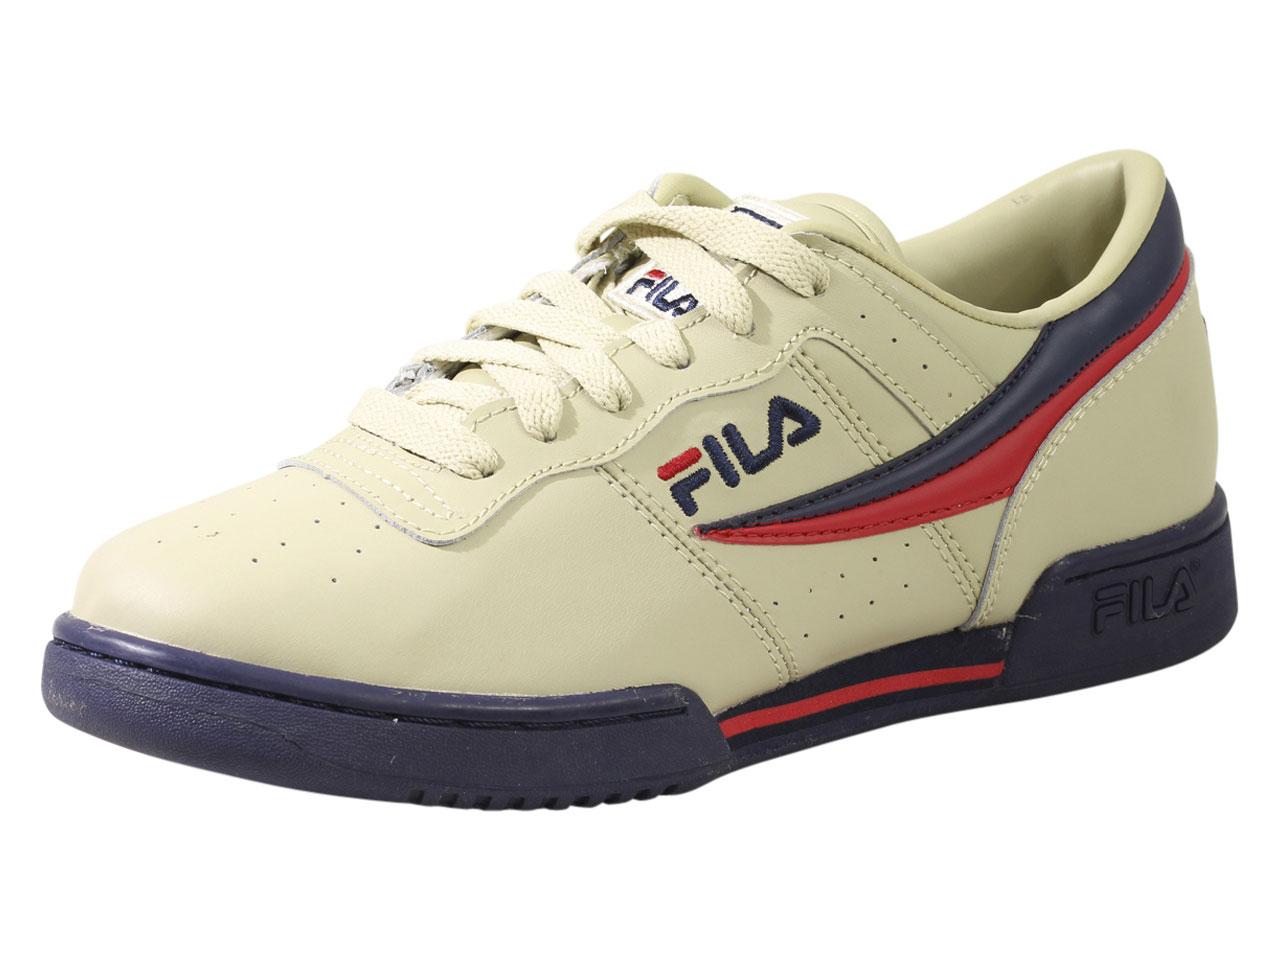 Fila original männer original Fila fitness - Turnschuhe, schuhe aebf81